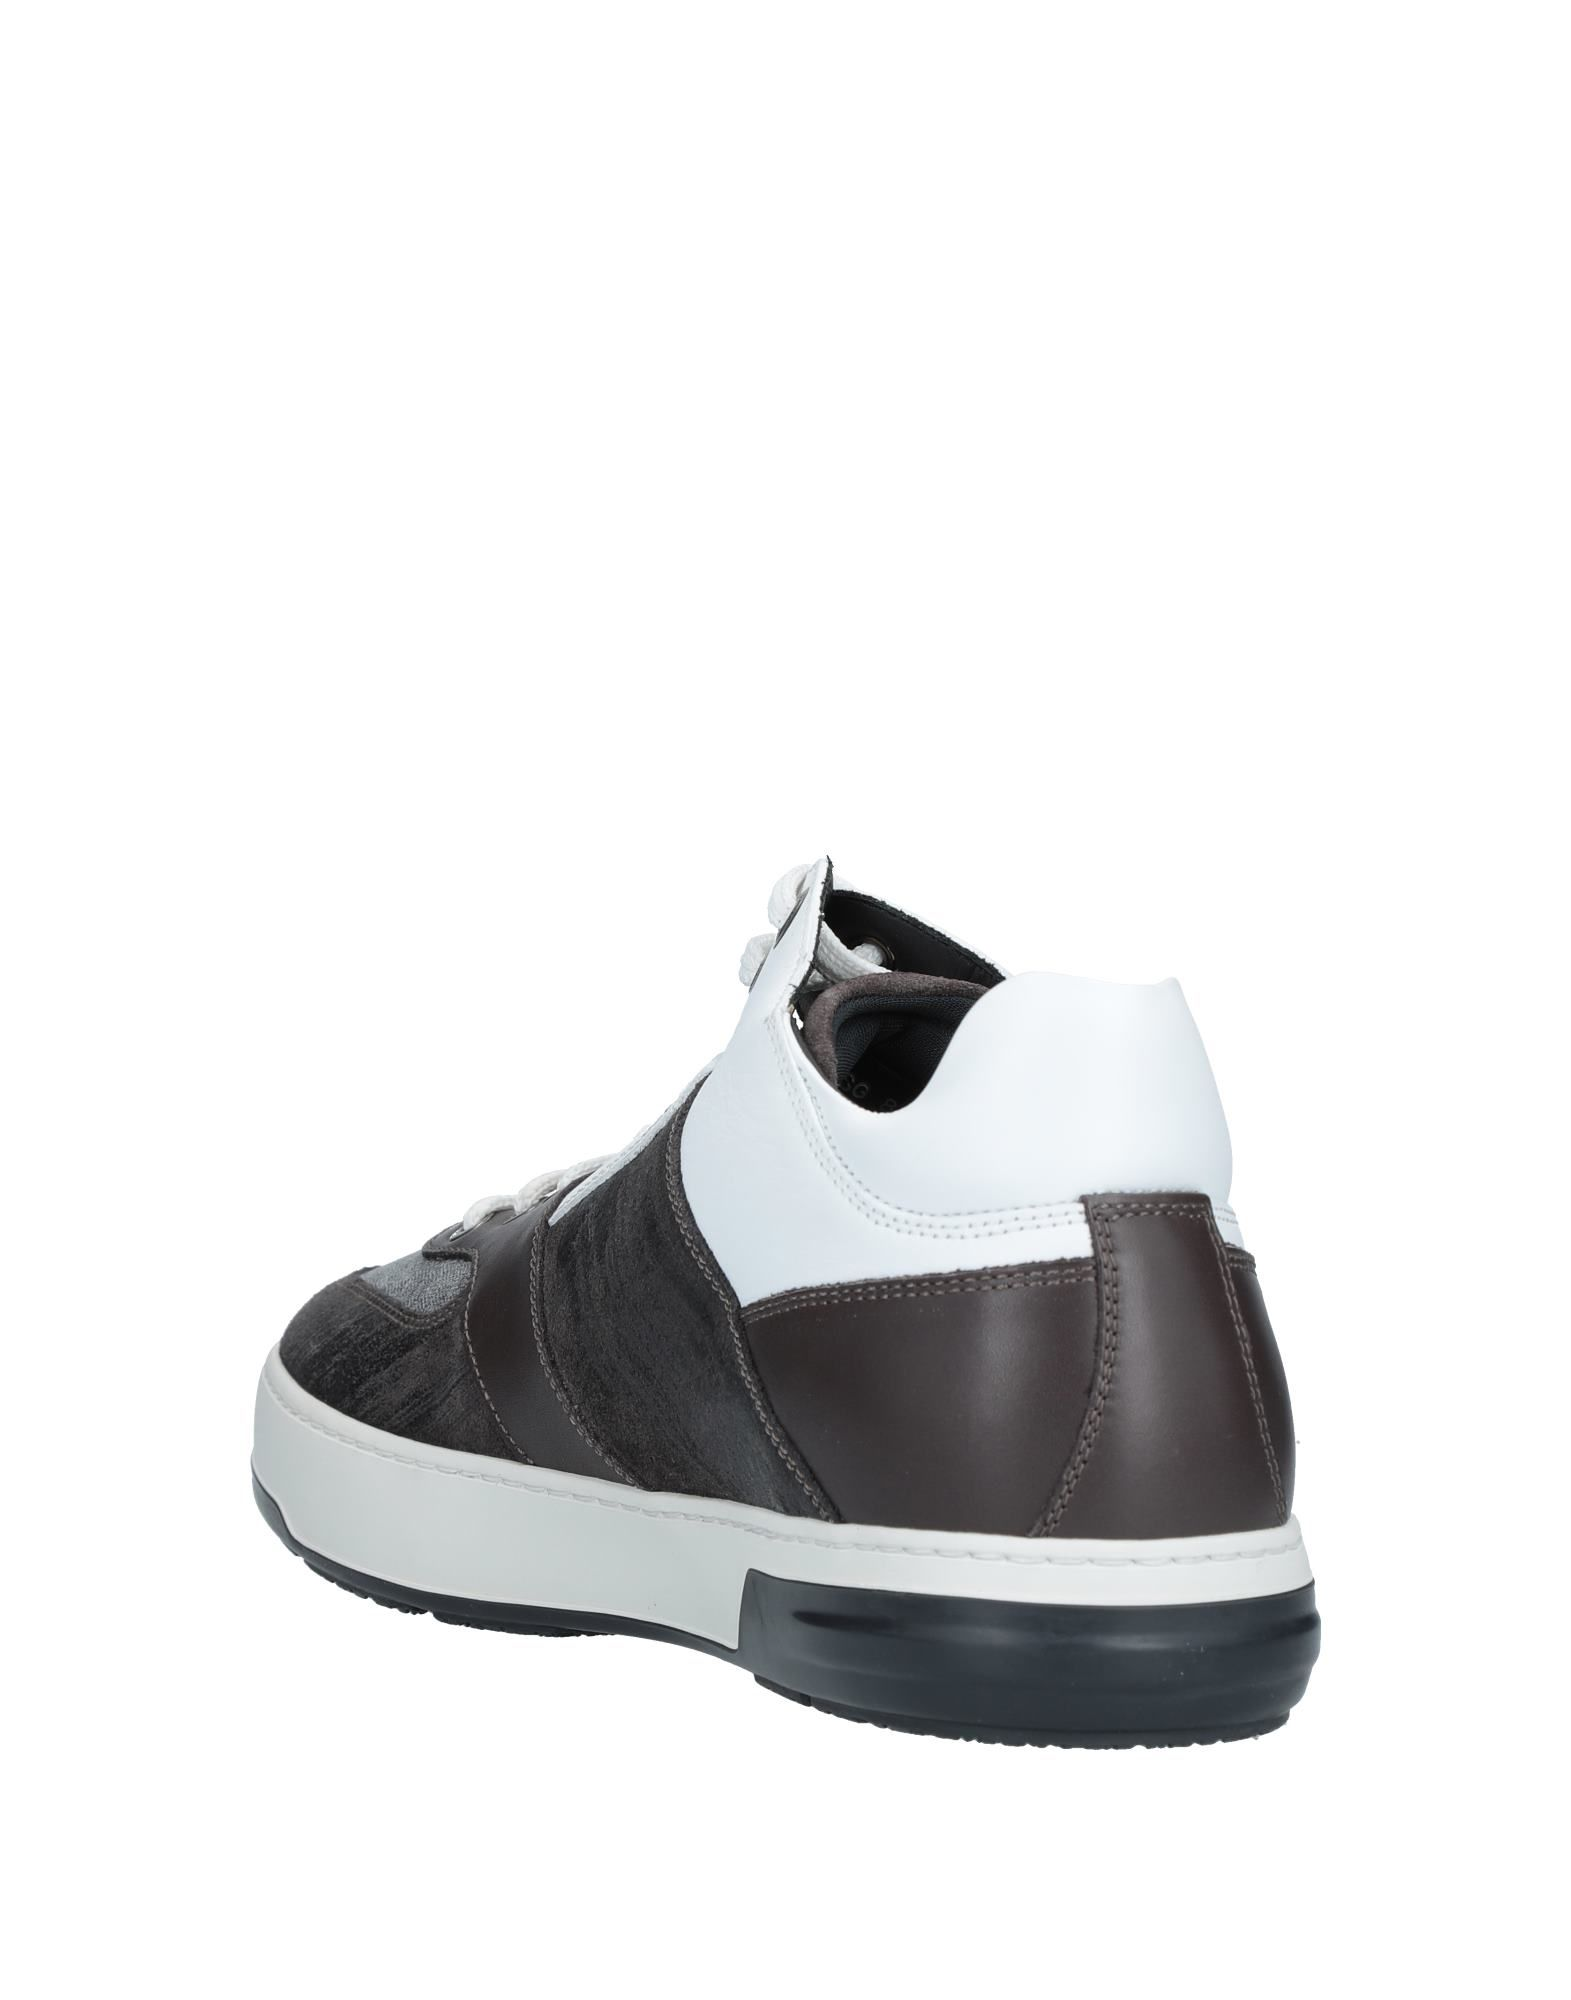 Salvatore Ferragamo Sneakers Herren  11528598KM Gute Qualität beliebte Schuhe